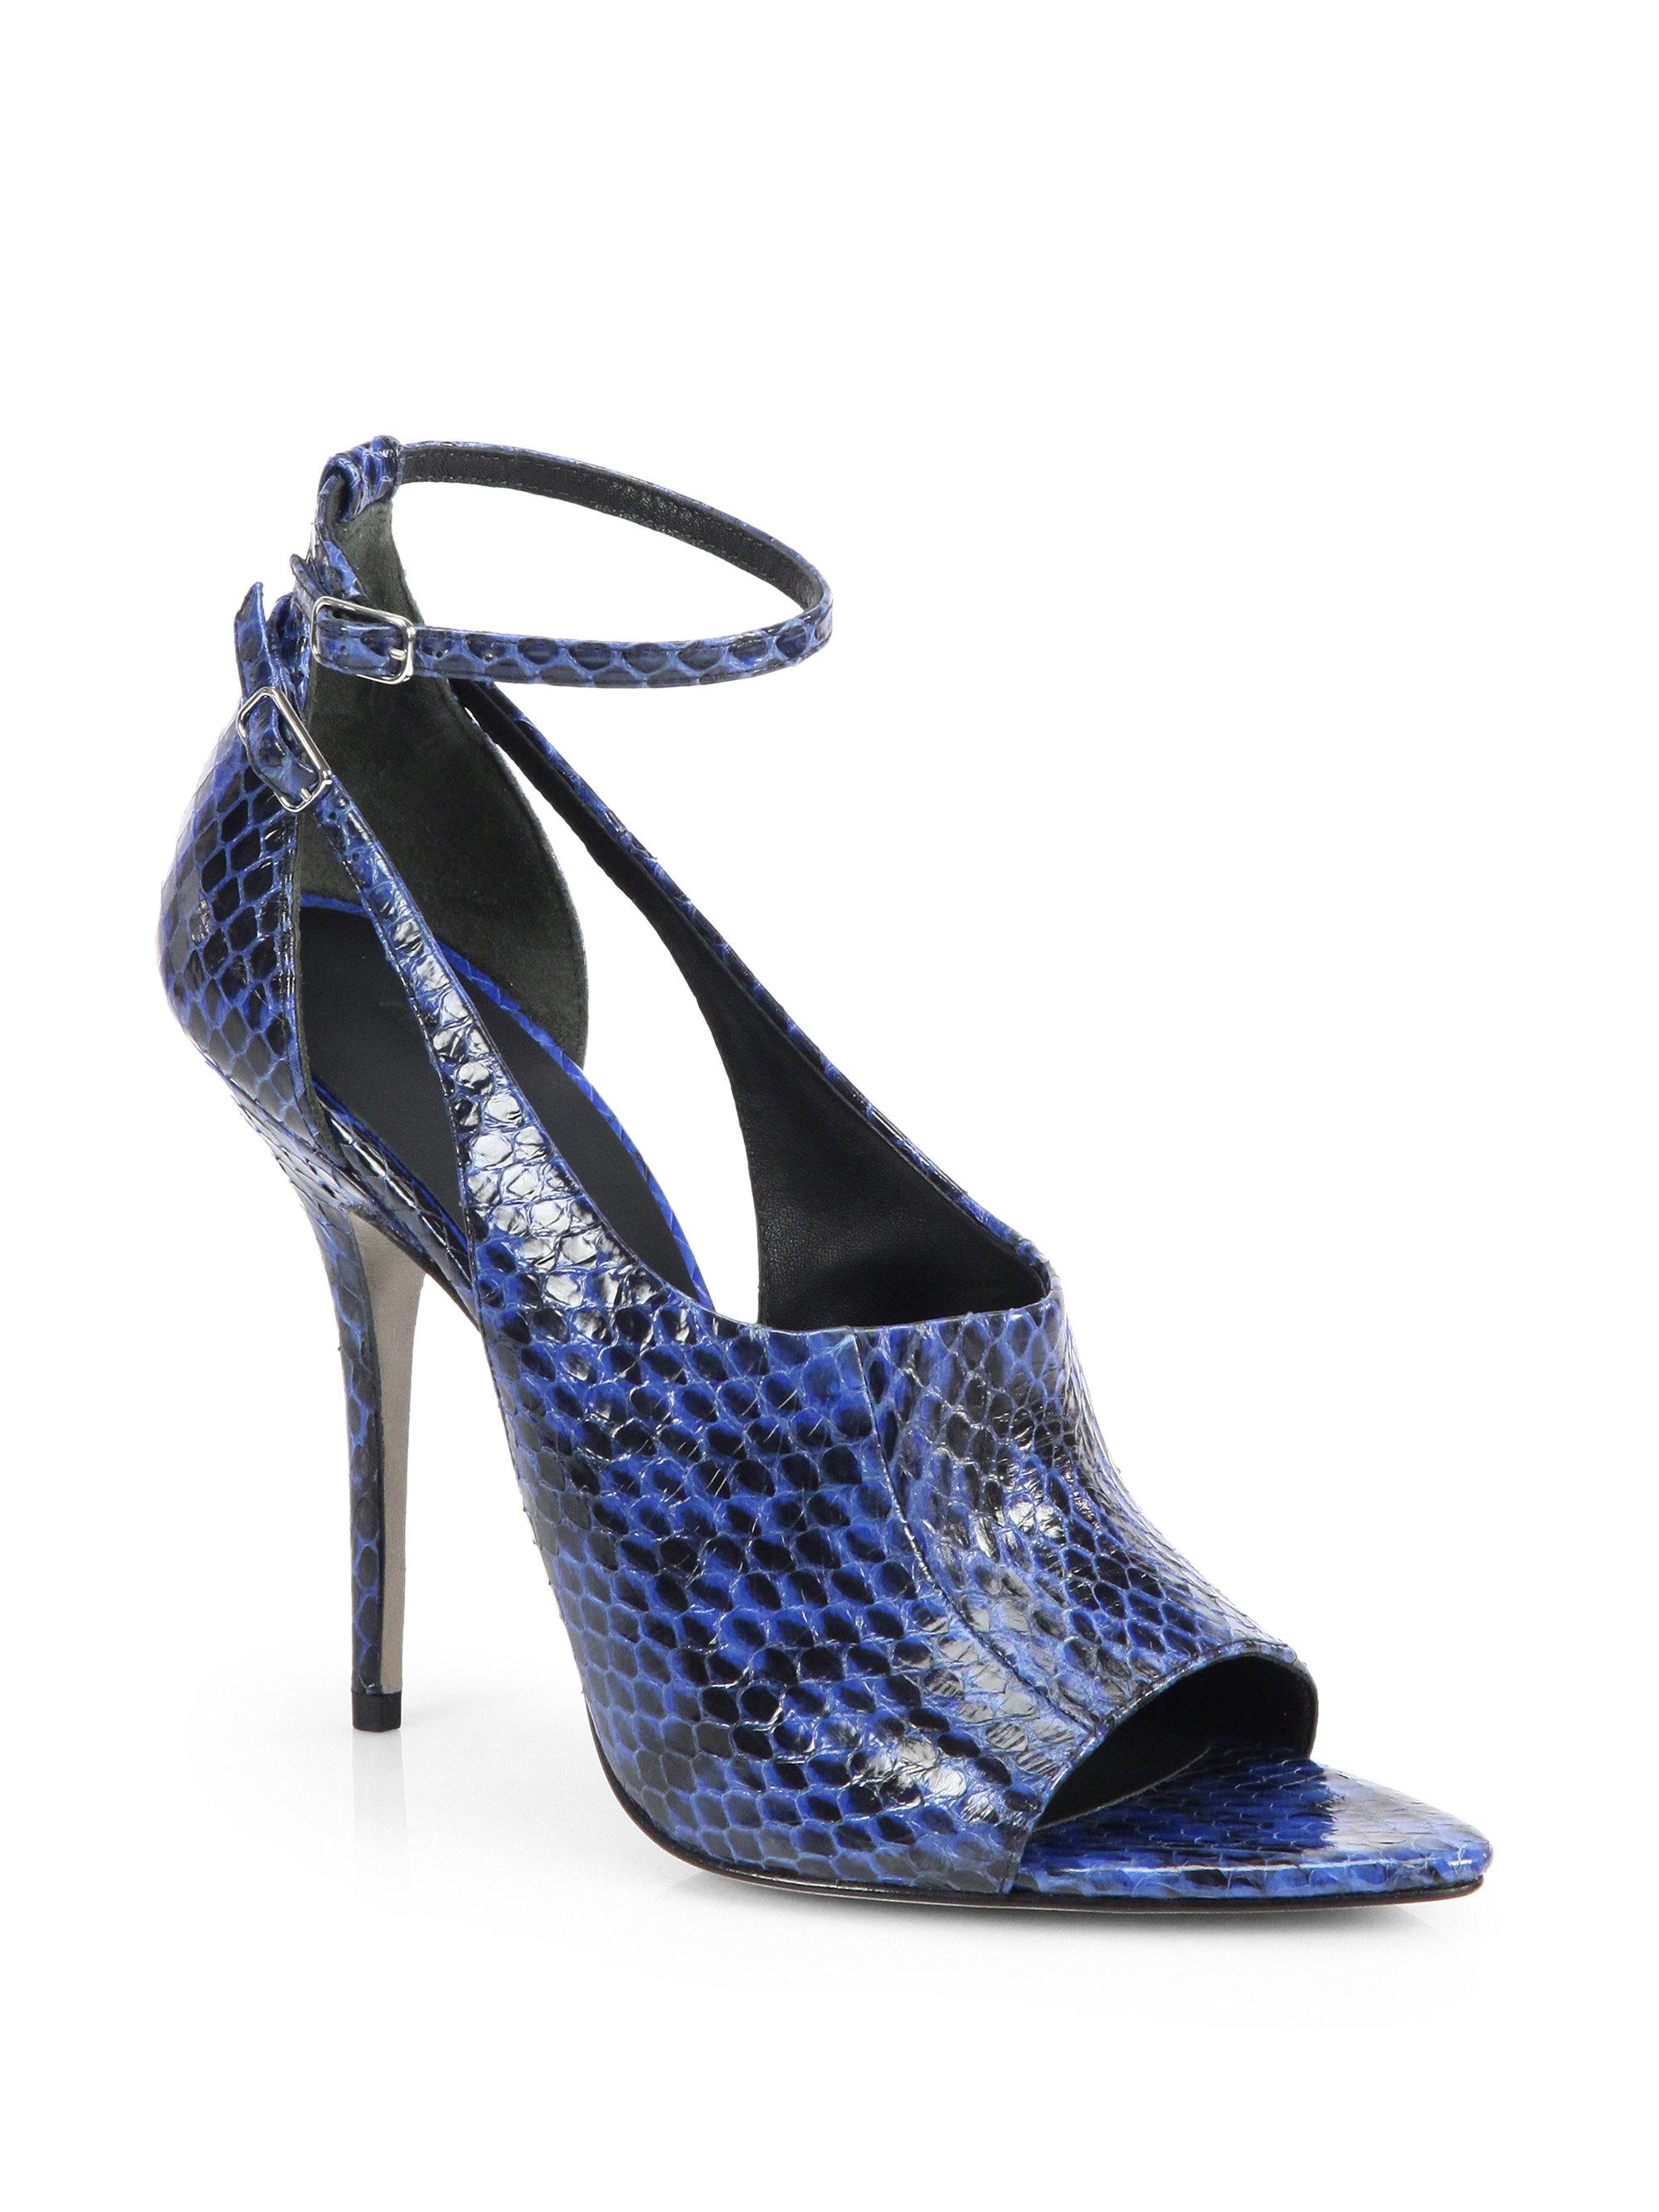 88bdac19ffe Alexander Wang Blue Carolyn Snakeskin Anklestrap Sandals